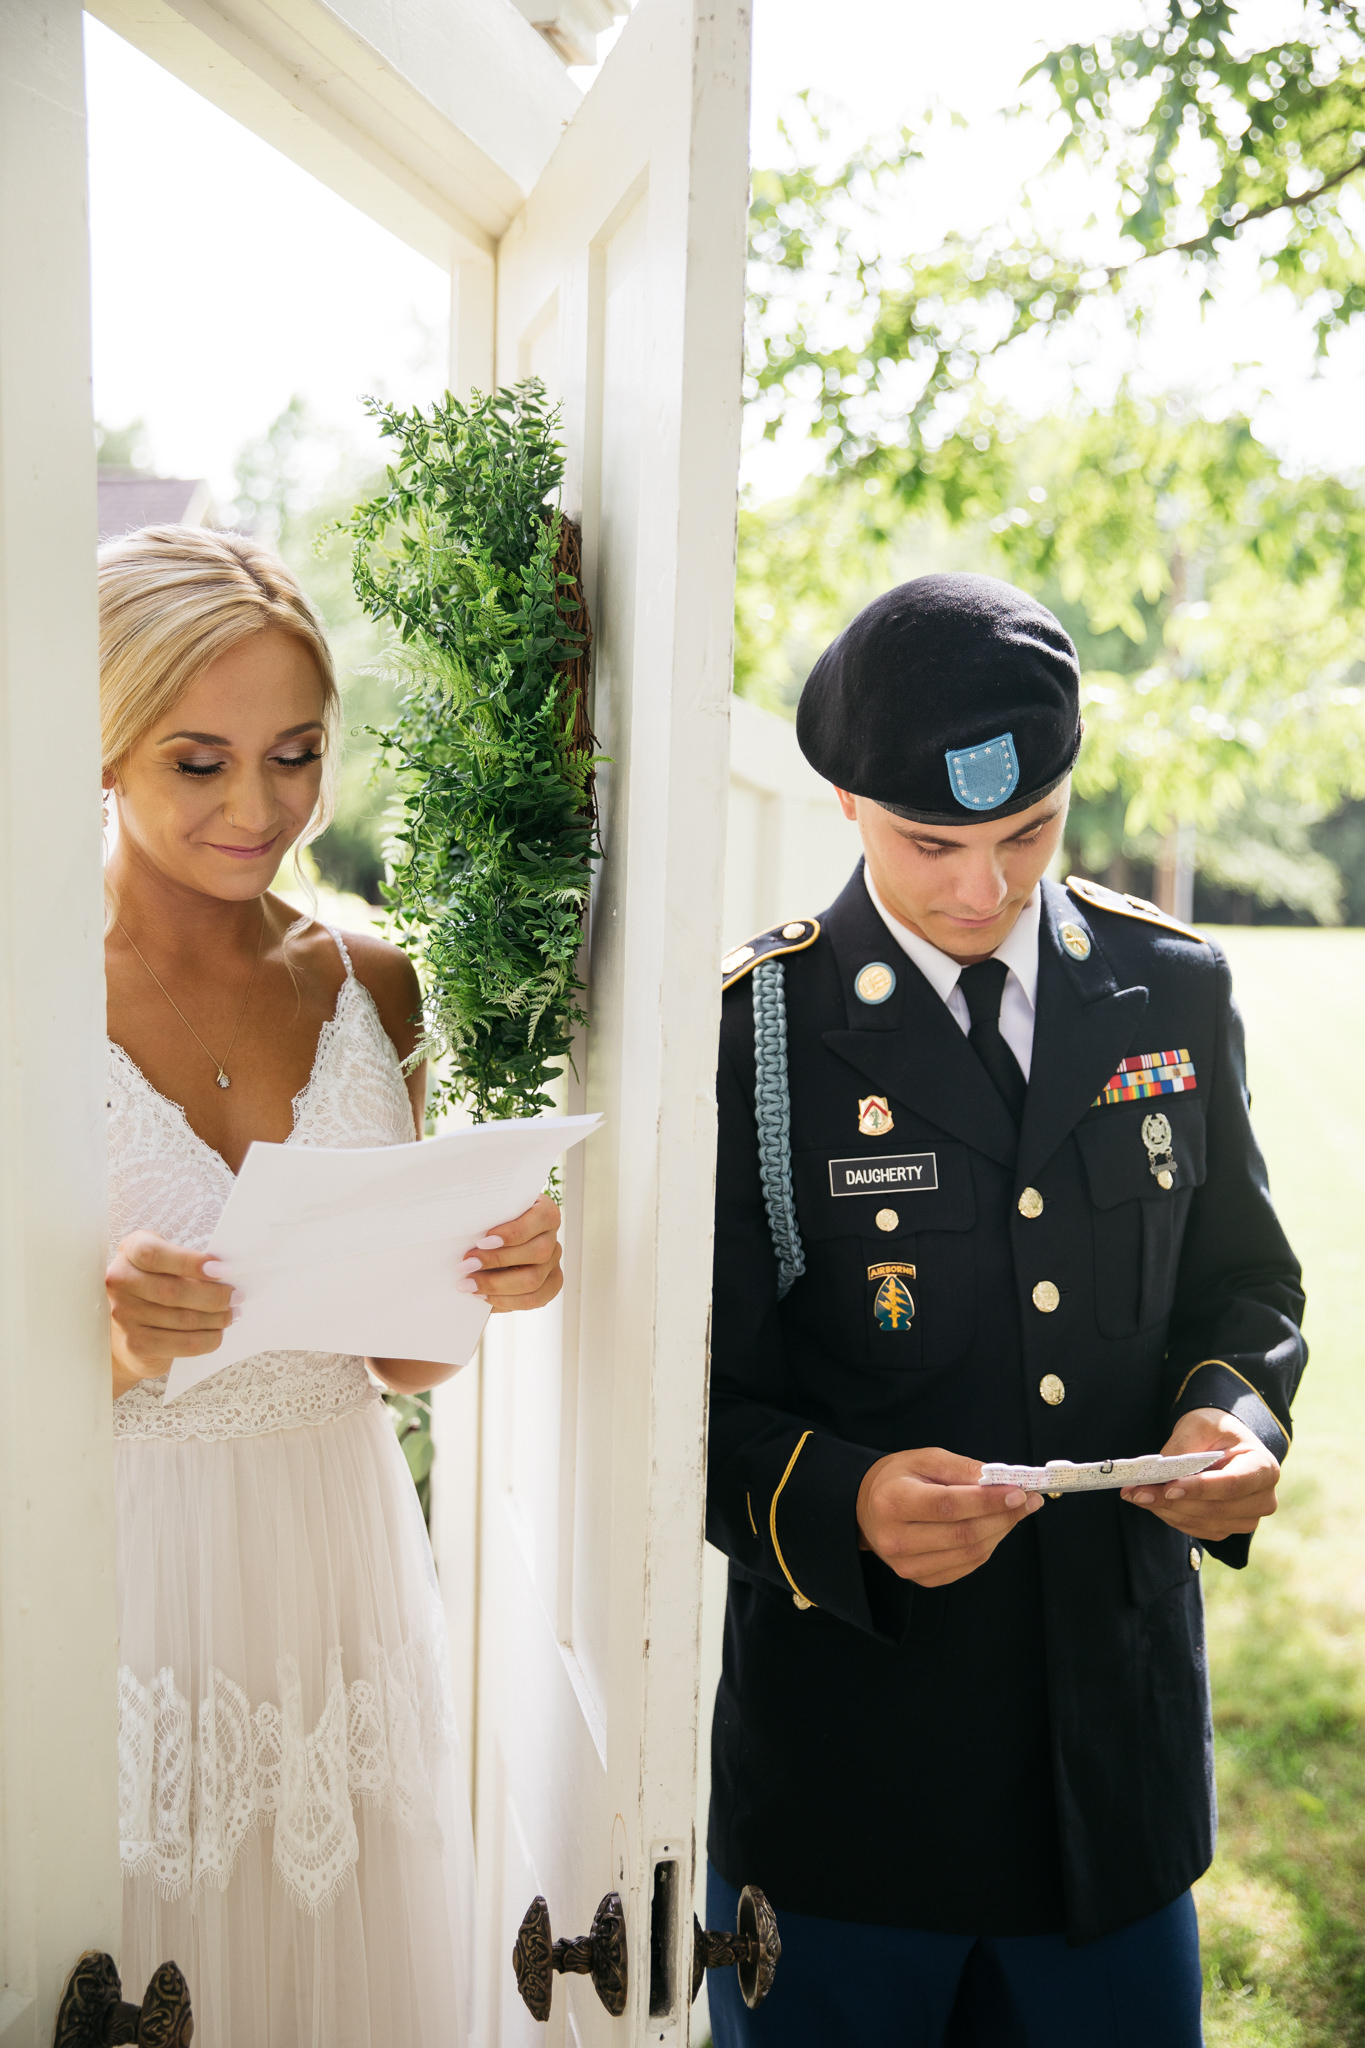 backyard-wedding-thewarmtharoundyou-lexy-branson-25.jpg